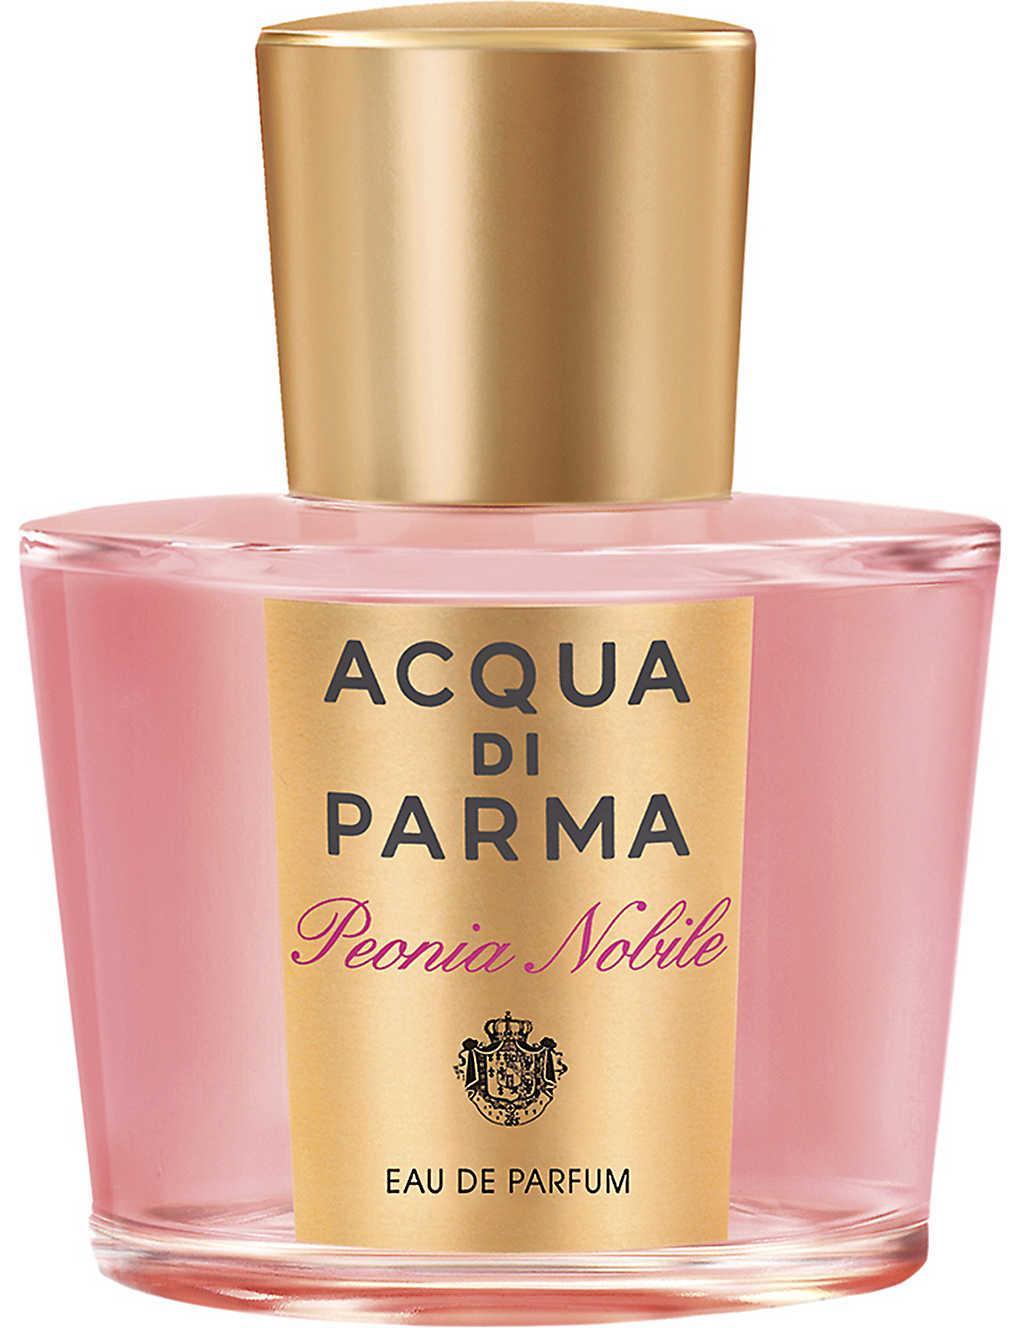 acqua di parma peonia nobile woda perfumowana 1 ml